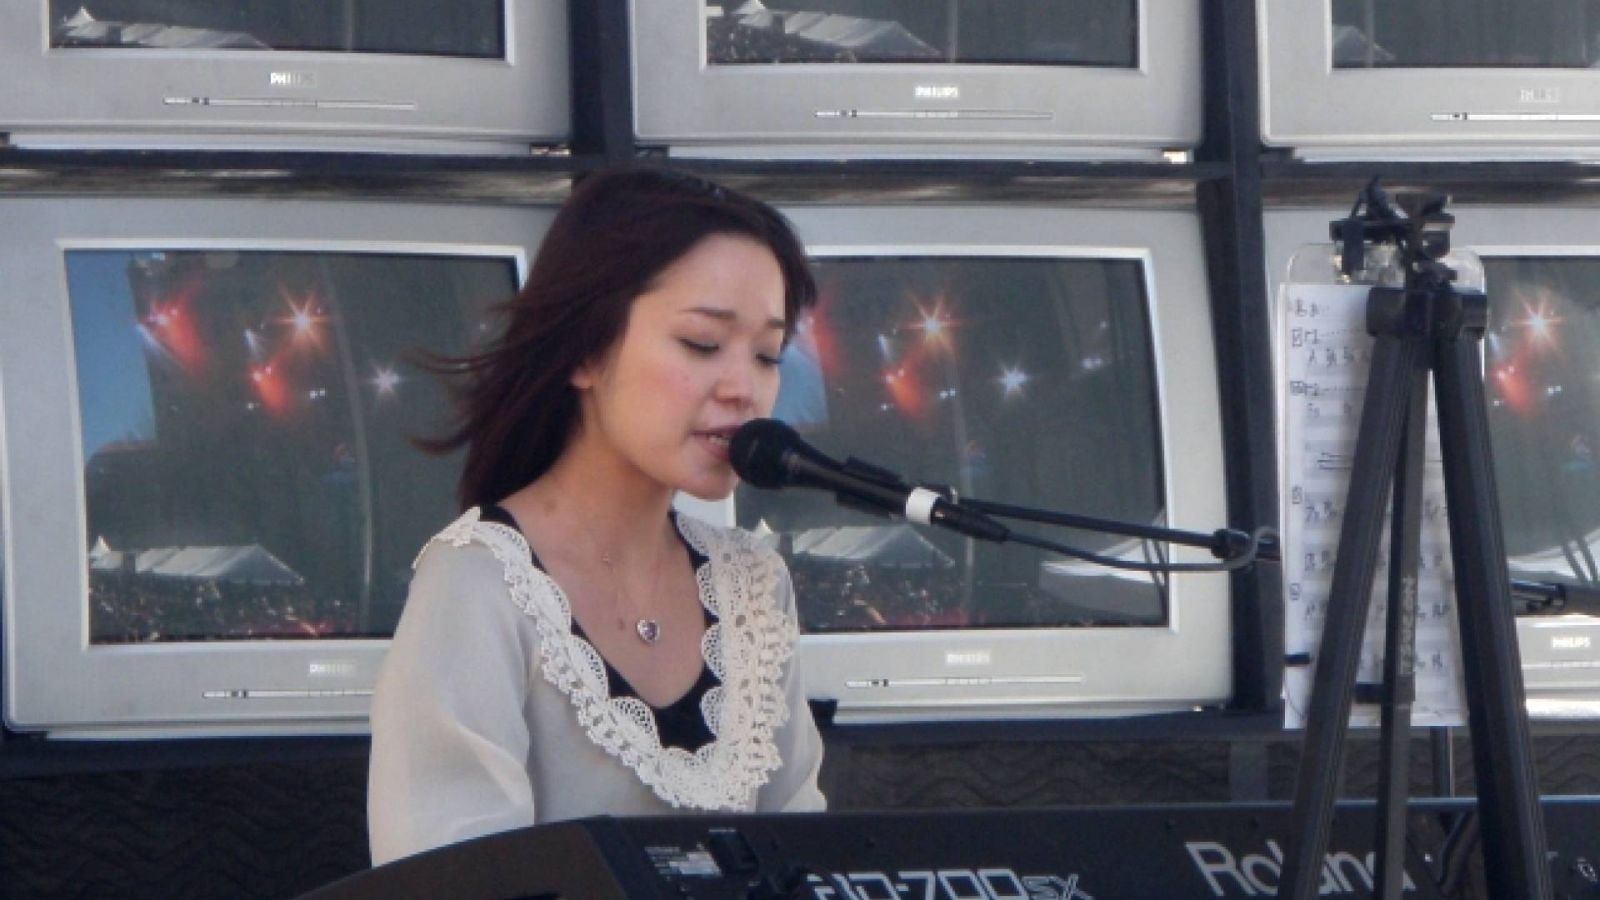 Daisuki da yo, novo single de Ai Kawashima © Kawashima Ai - JaME - Chadwik Rozell